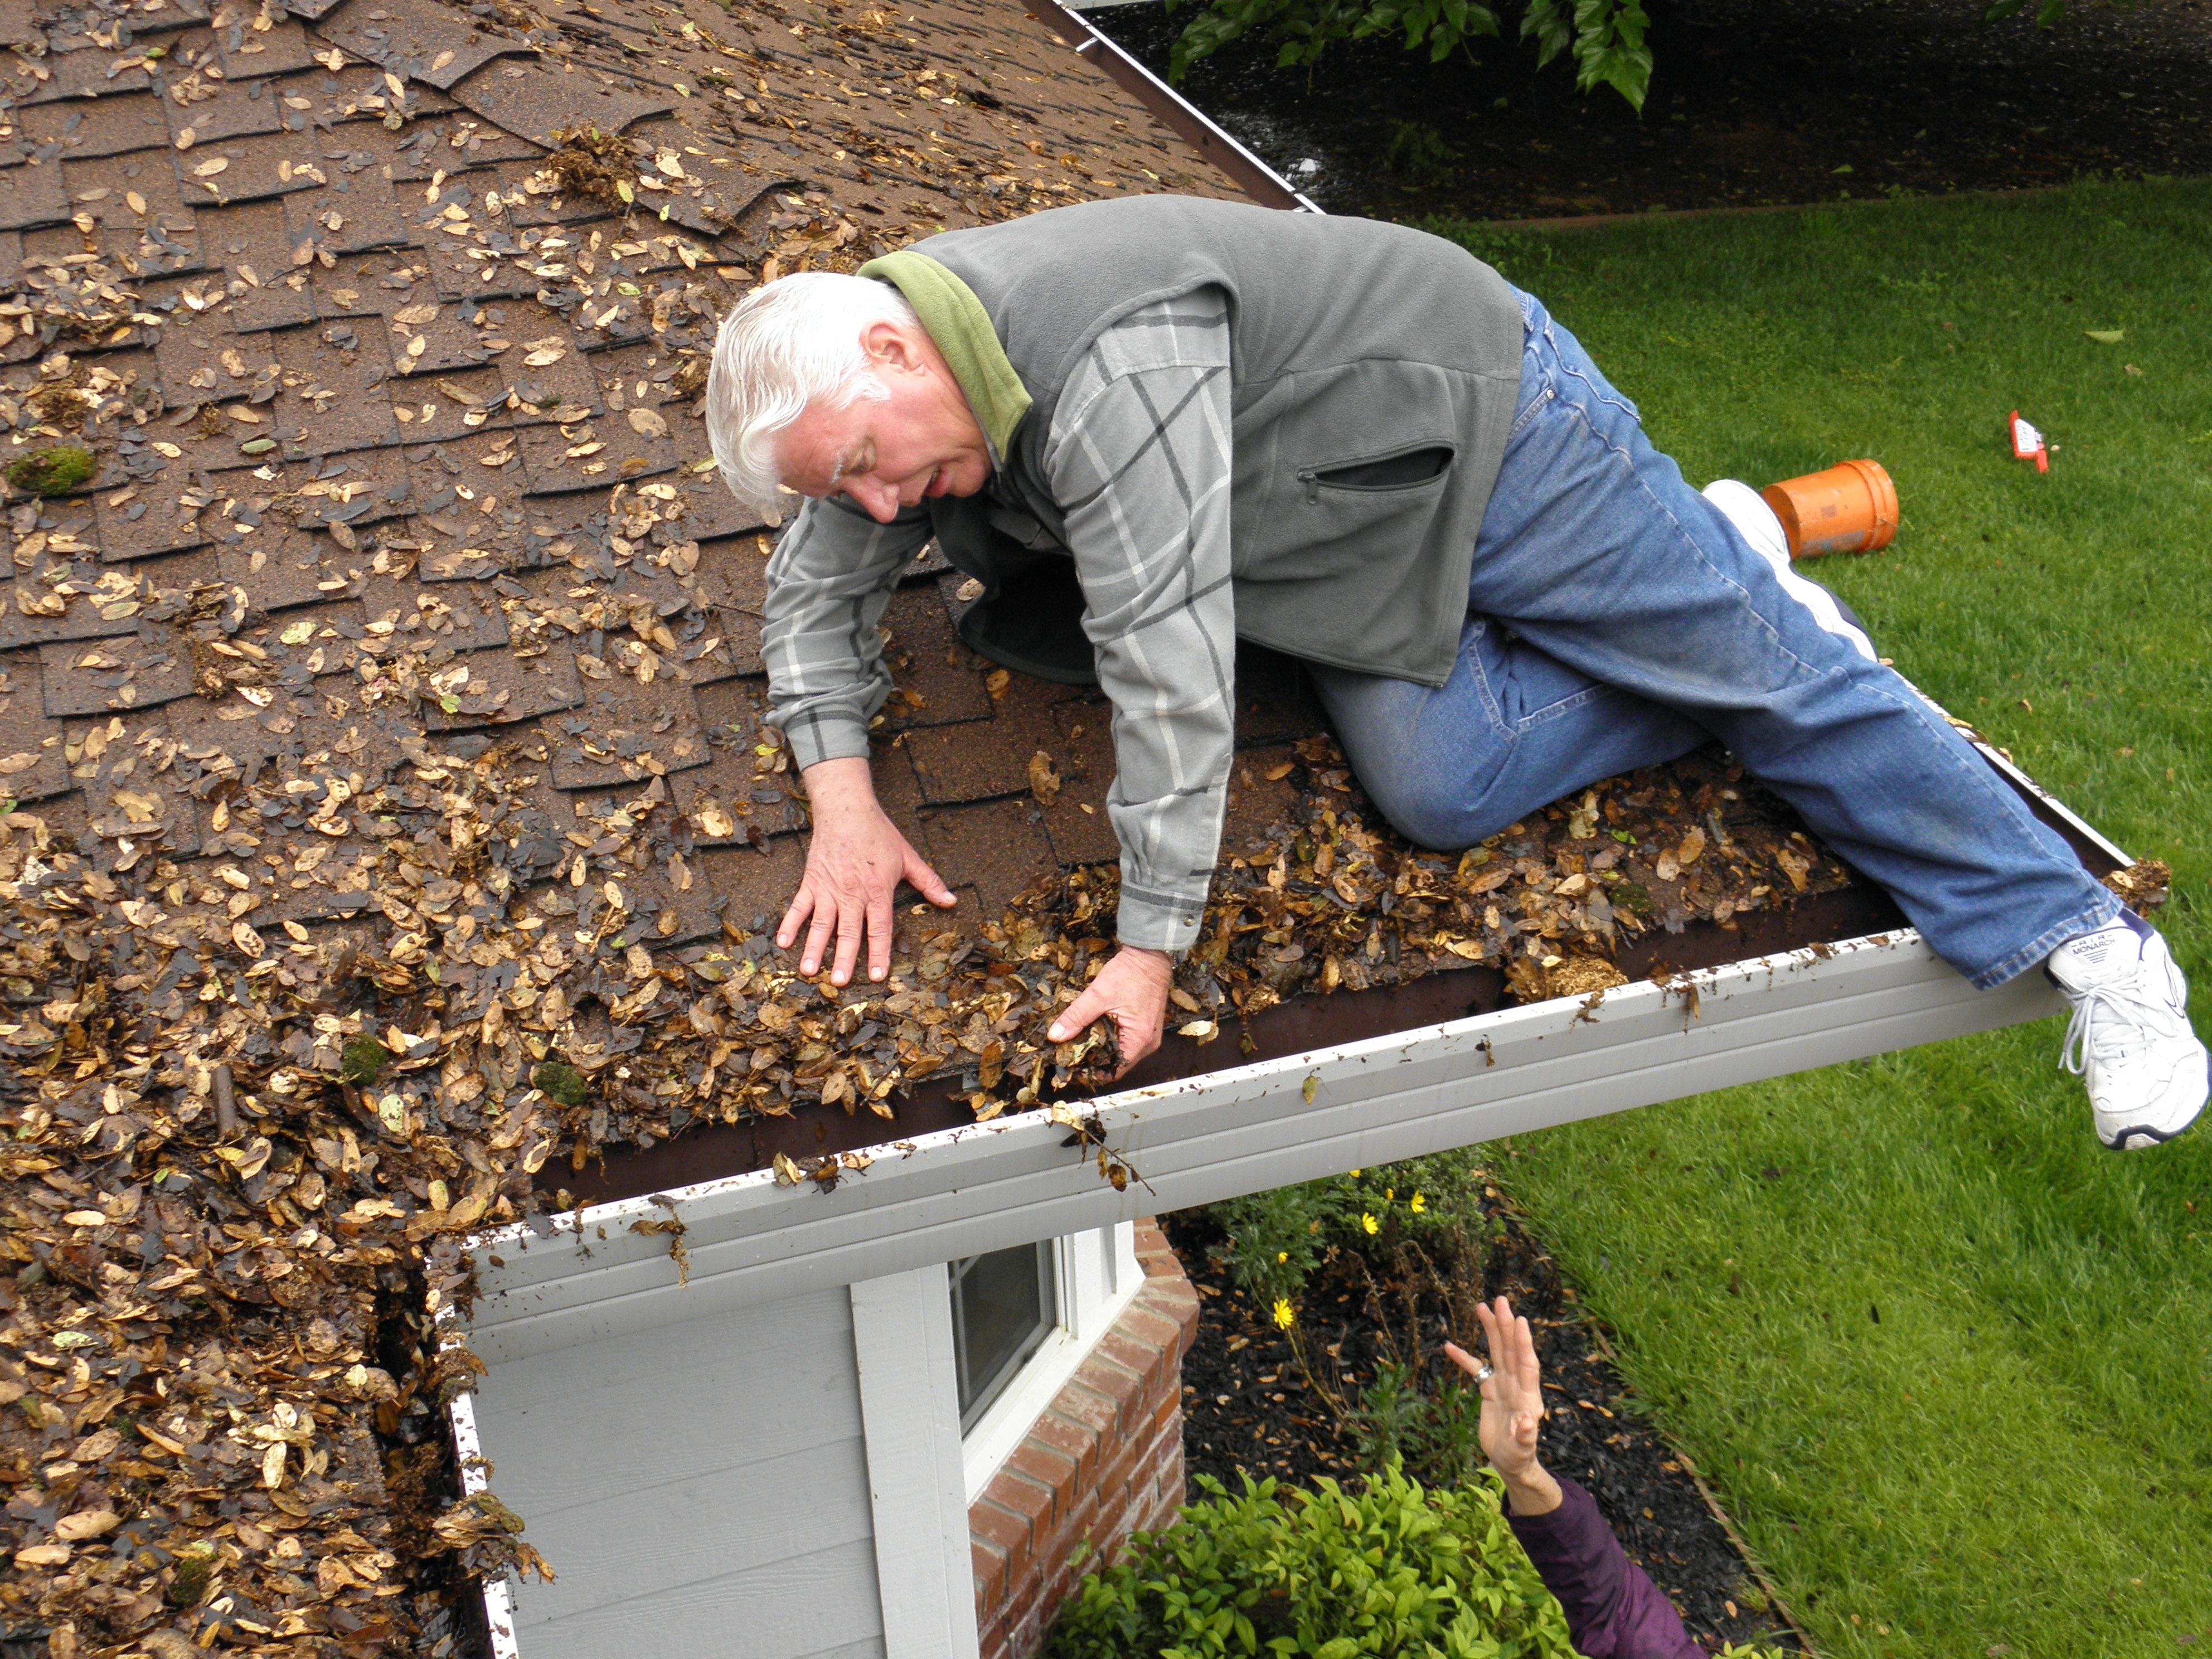 clean-gutters-2027-rain-gutter-cleaning-3968-x-2976